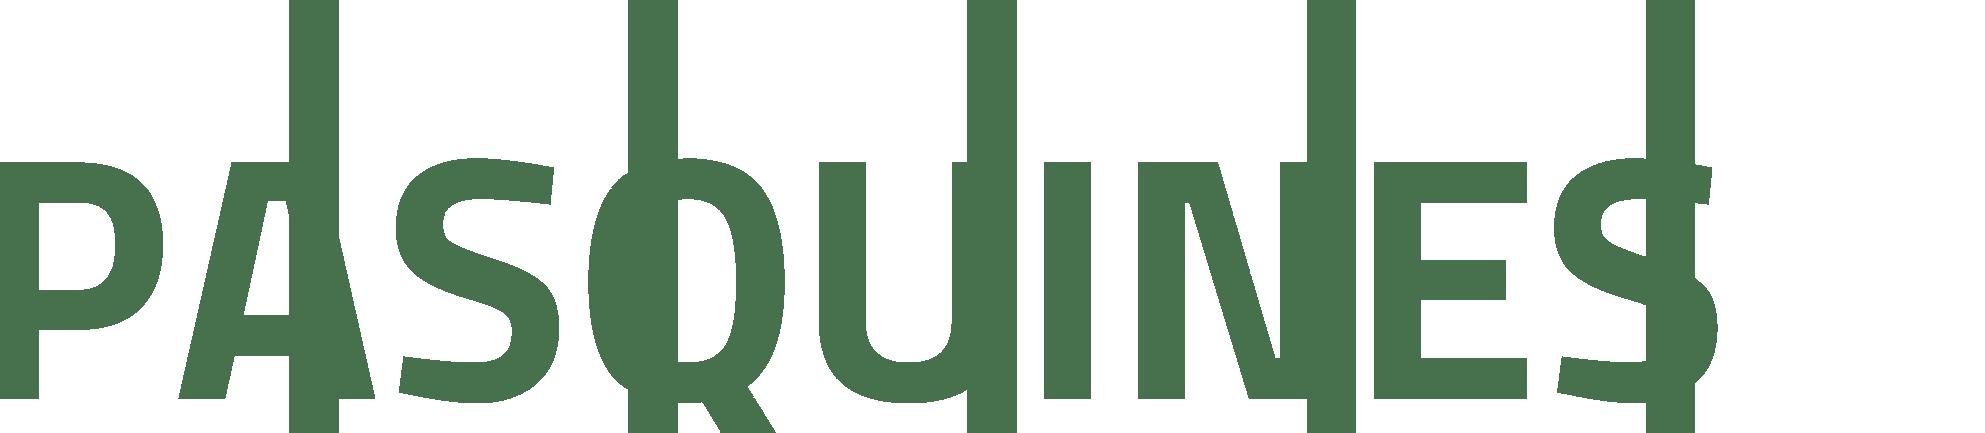 Pasquines logo